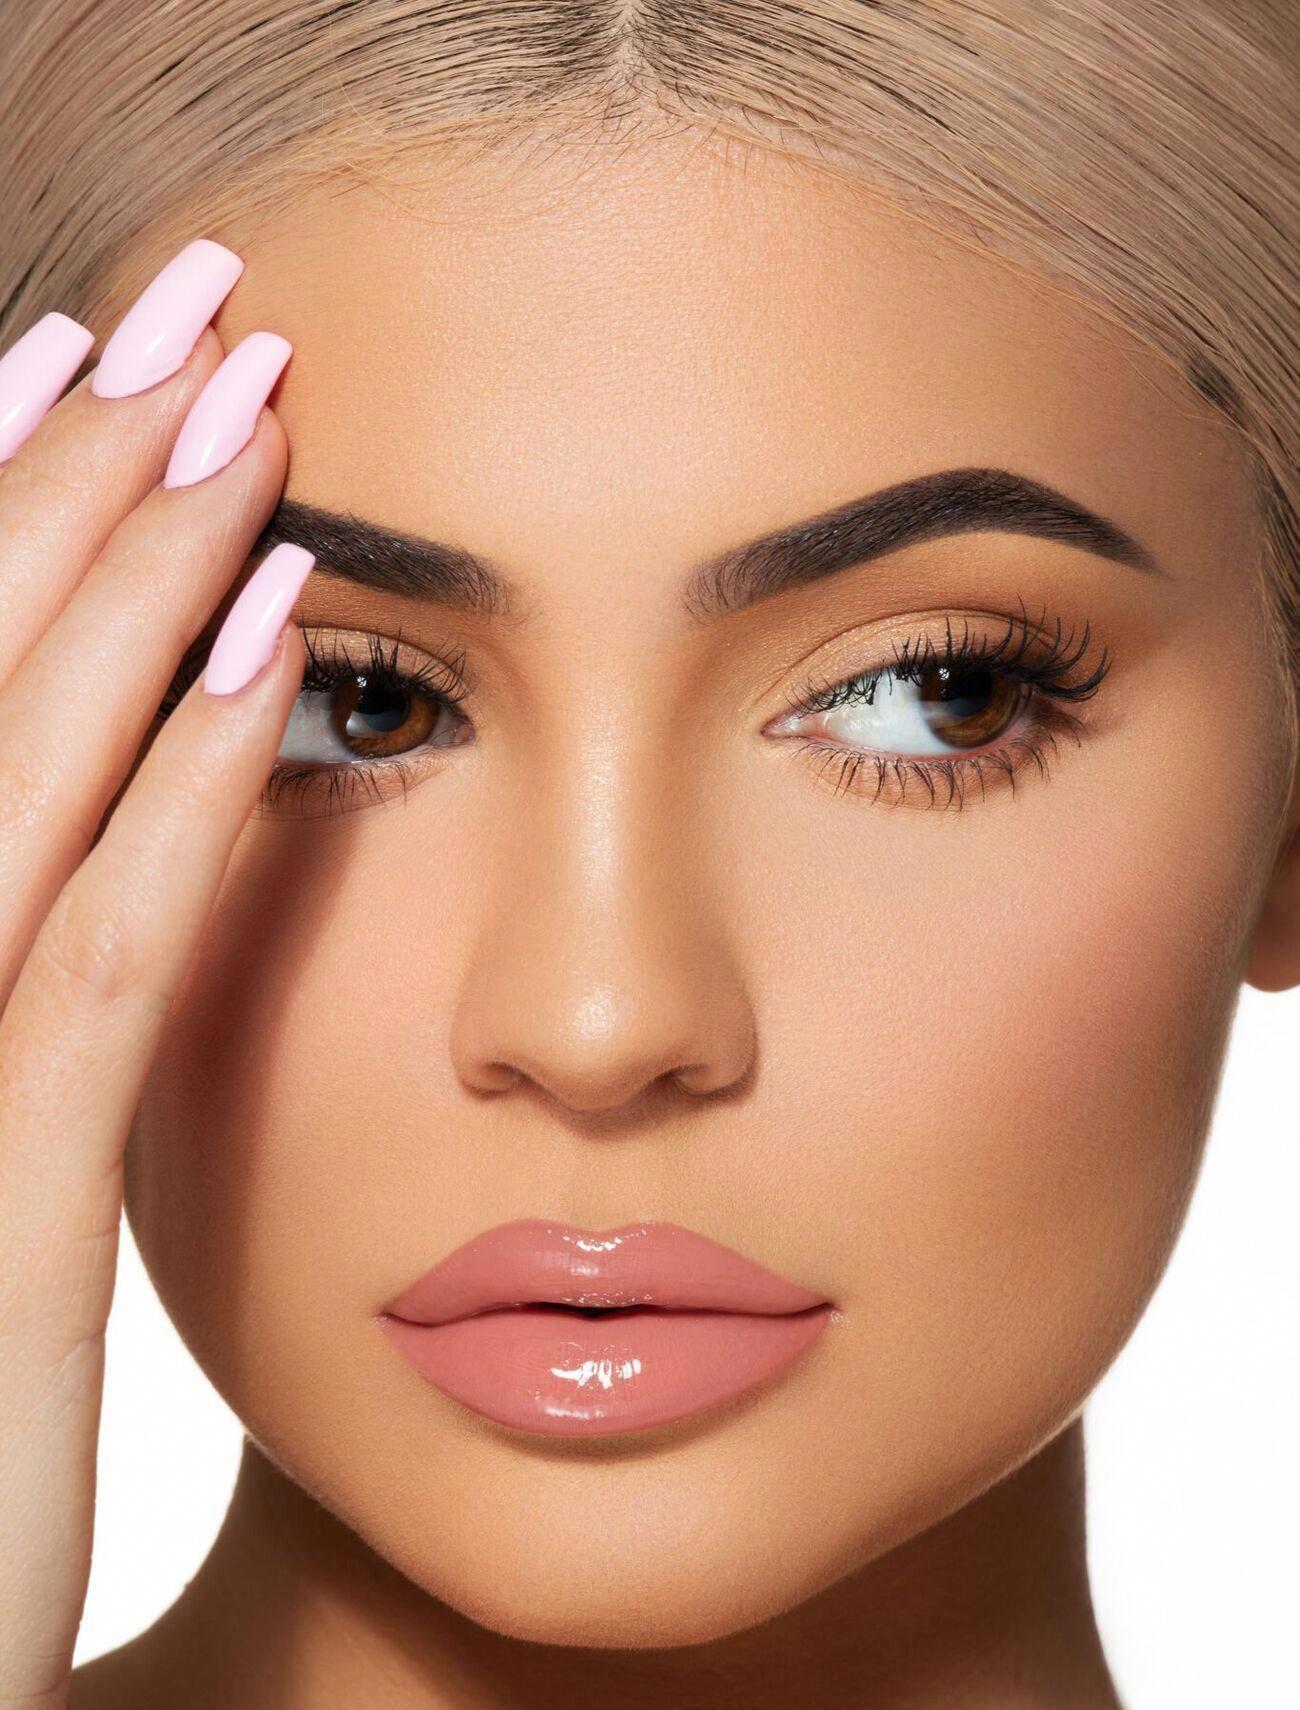 roller lash mascara makeupforwedding in 2020 Kylie